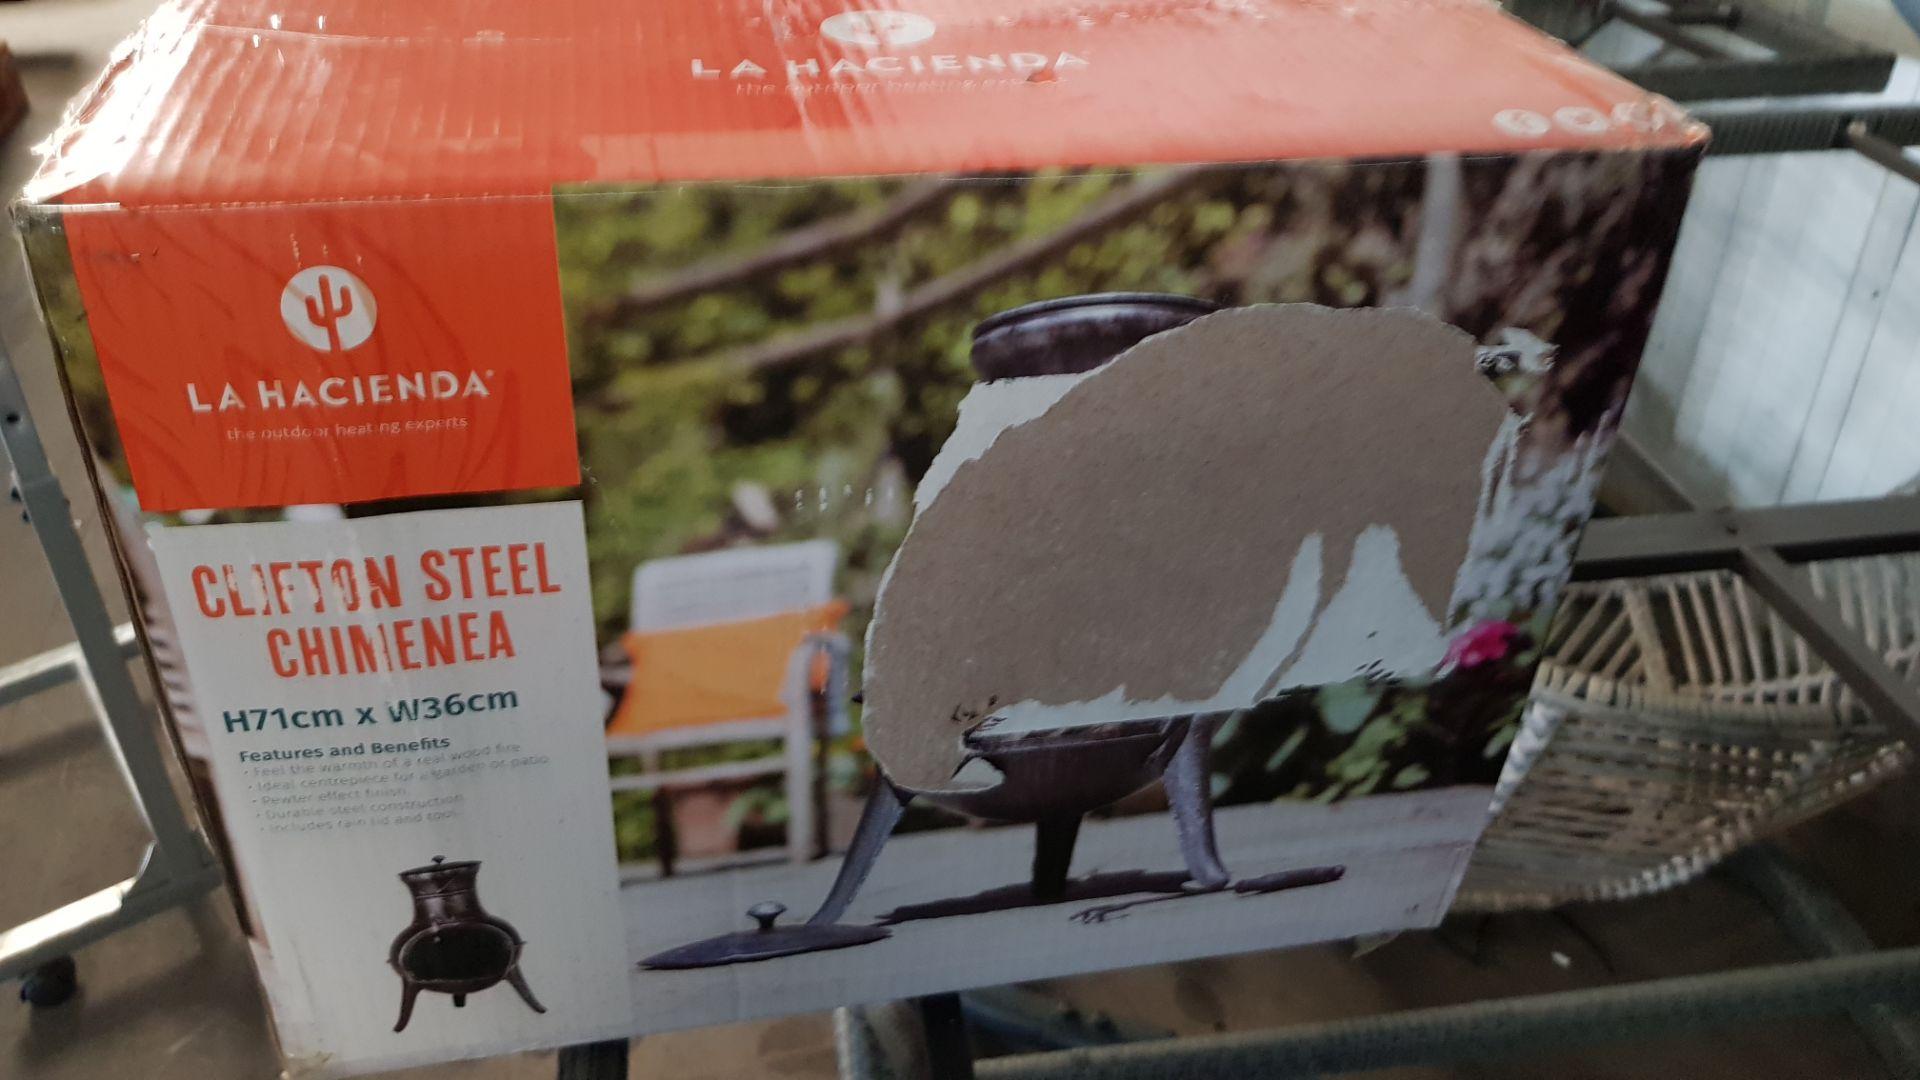 (P8) 1x La Hacienda Clifton Steel Chimenea (H71x W36cm). New, Sealed Item With Some Box Damage. - Image 4 of 4